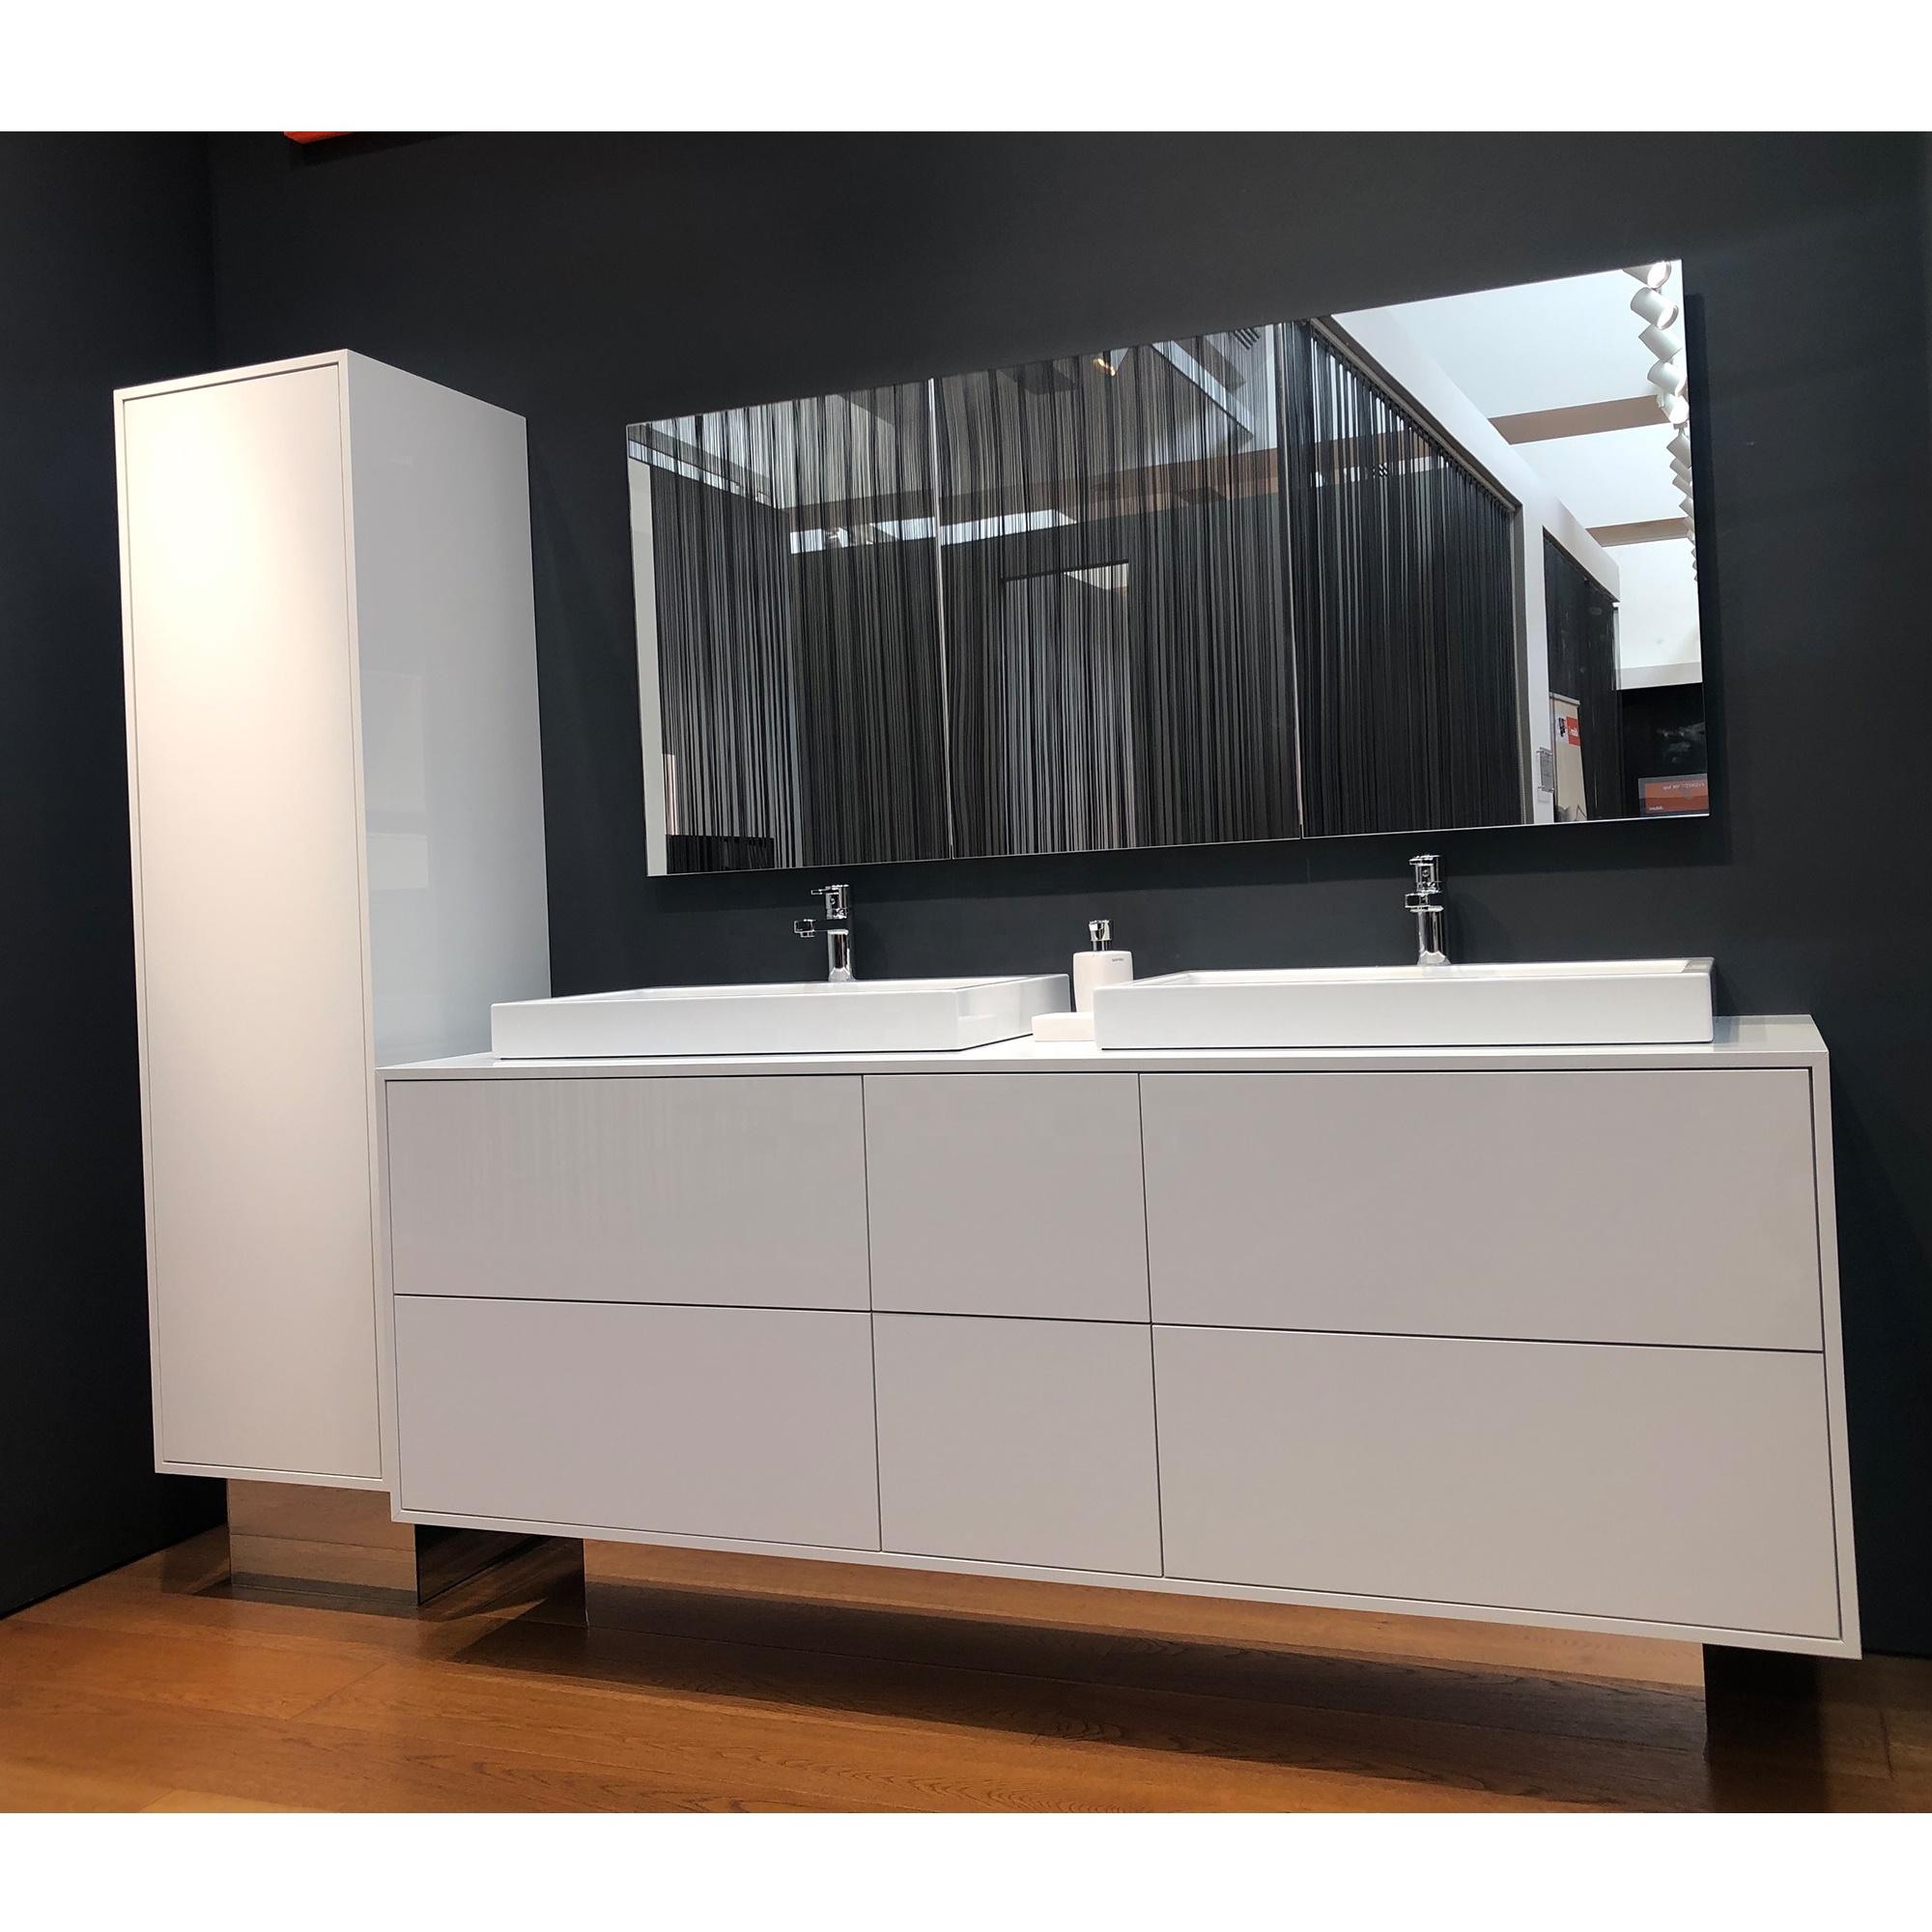 Nicocabinet European Design Modern